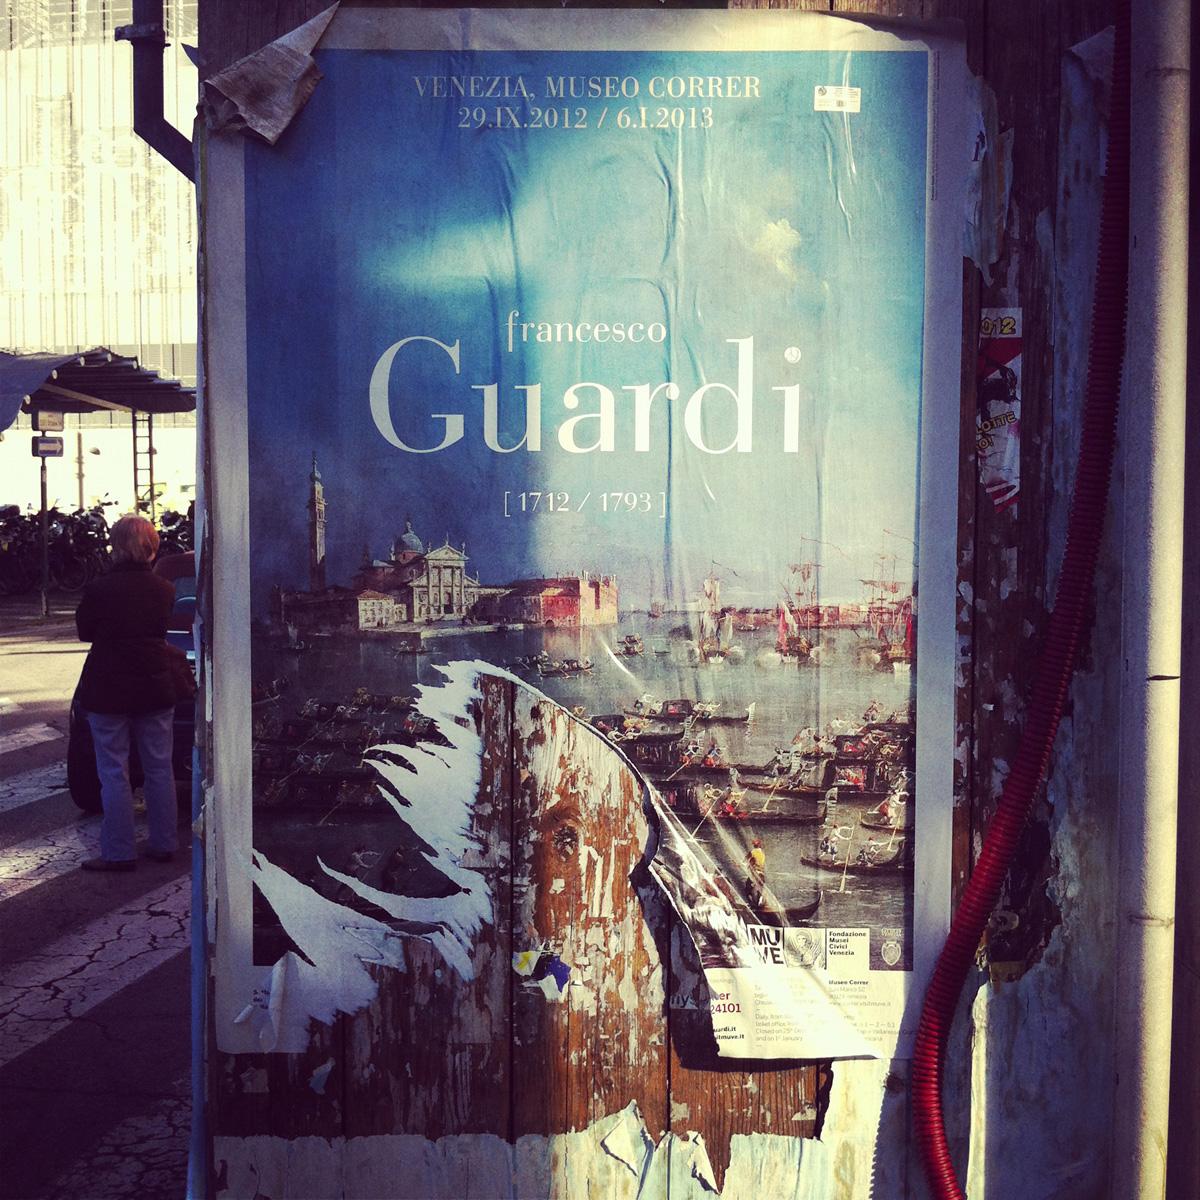 Francesco-Guardi-007